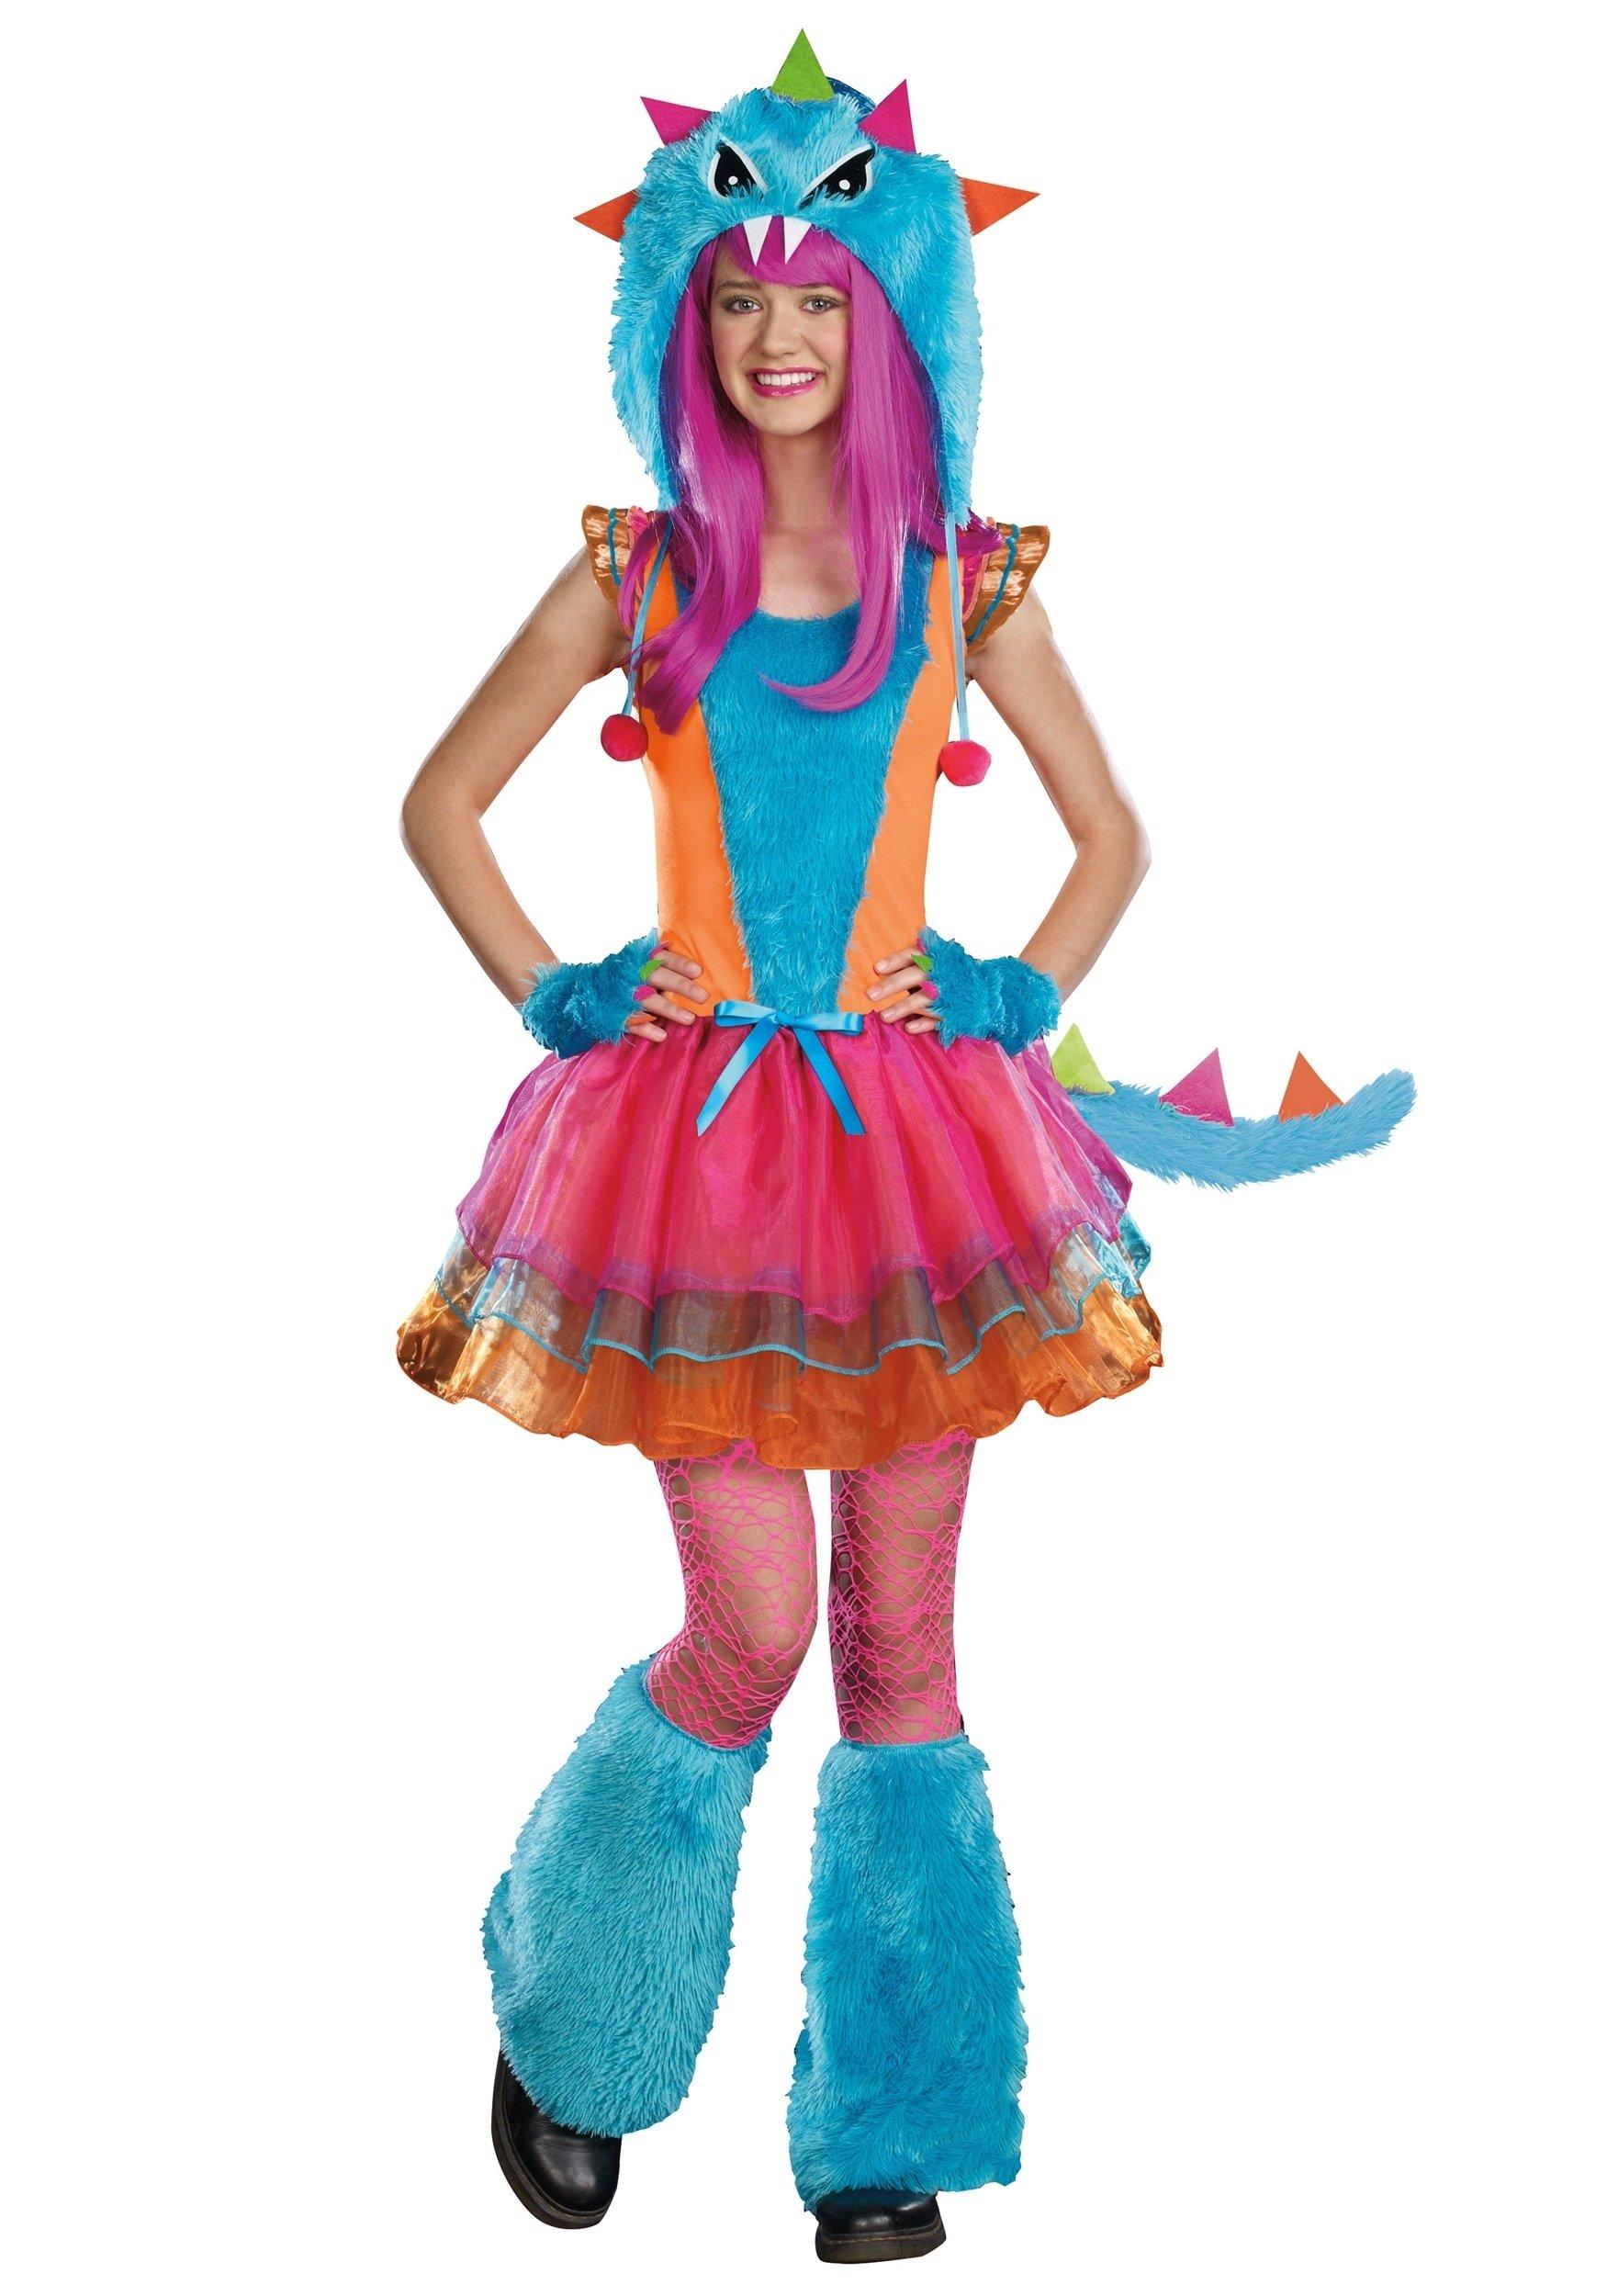 10 Ideal High School Halloween Costume Ideas halloween costumes for teens tweens halloweencostumes 4 2021